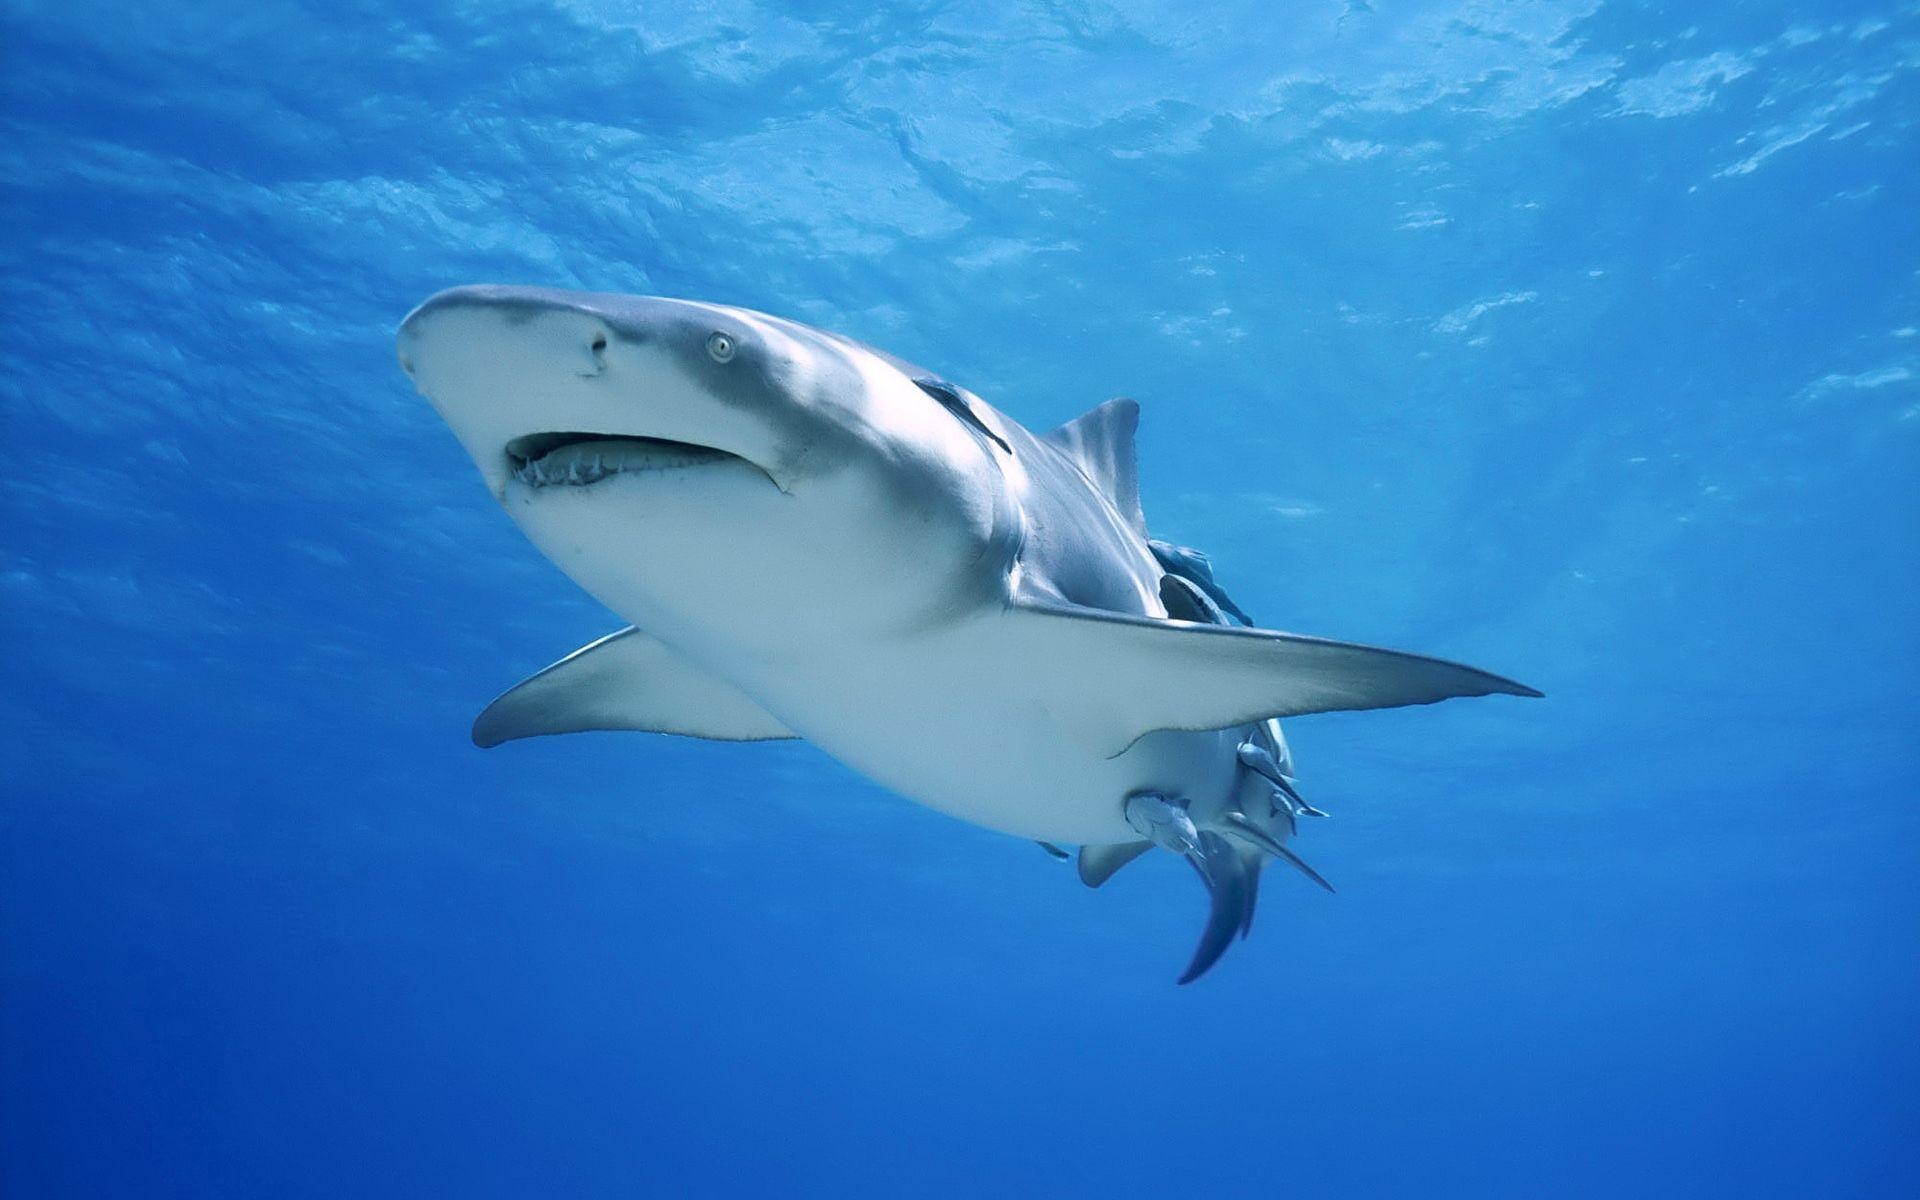 156877 download wallpaper Animals, Shark, To Swim, Swim, Sea, Ocean, Predator screensavers and pictures for free